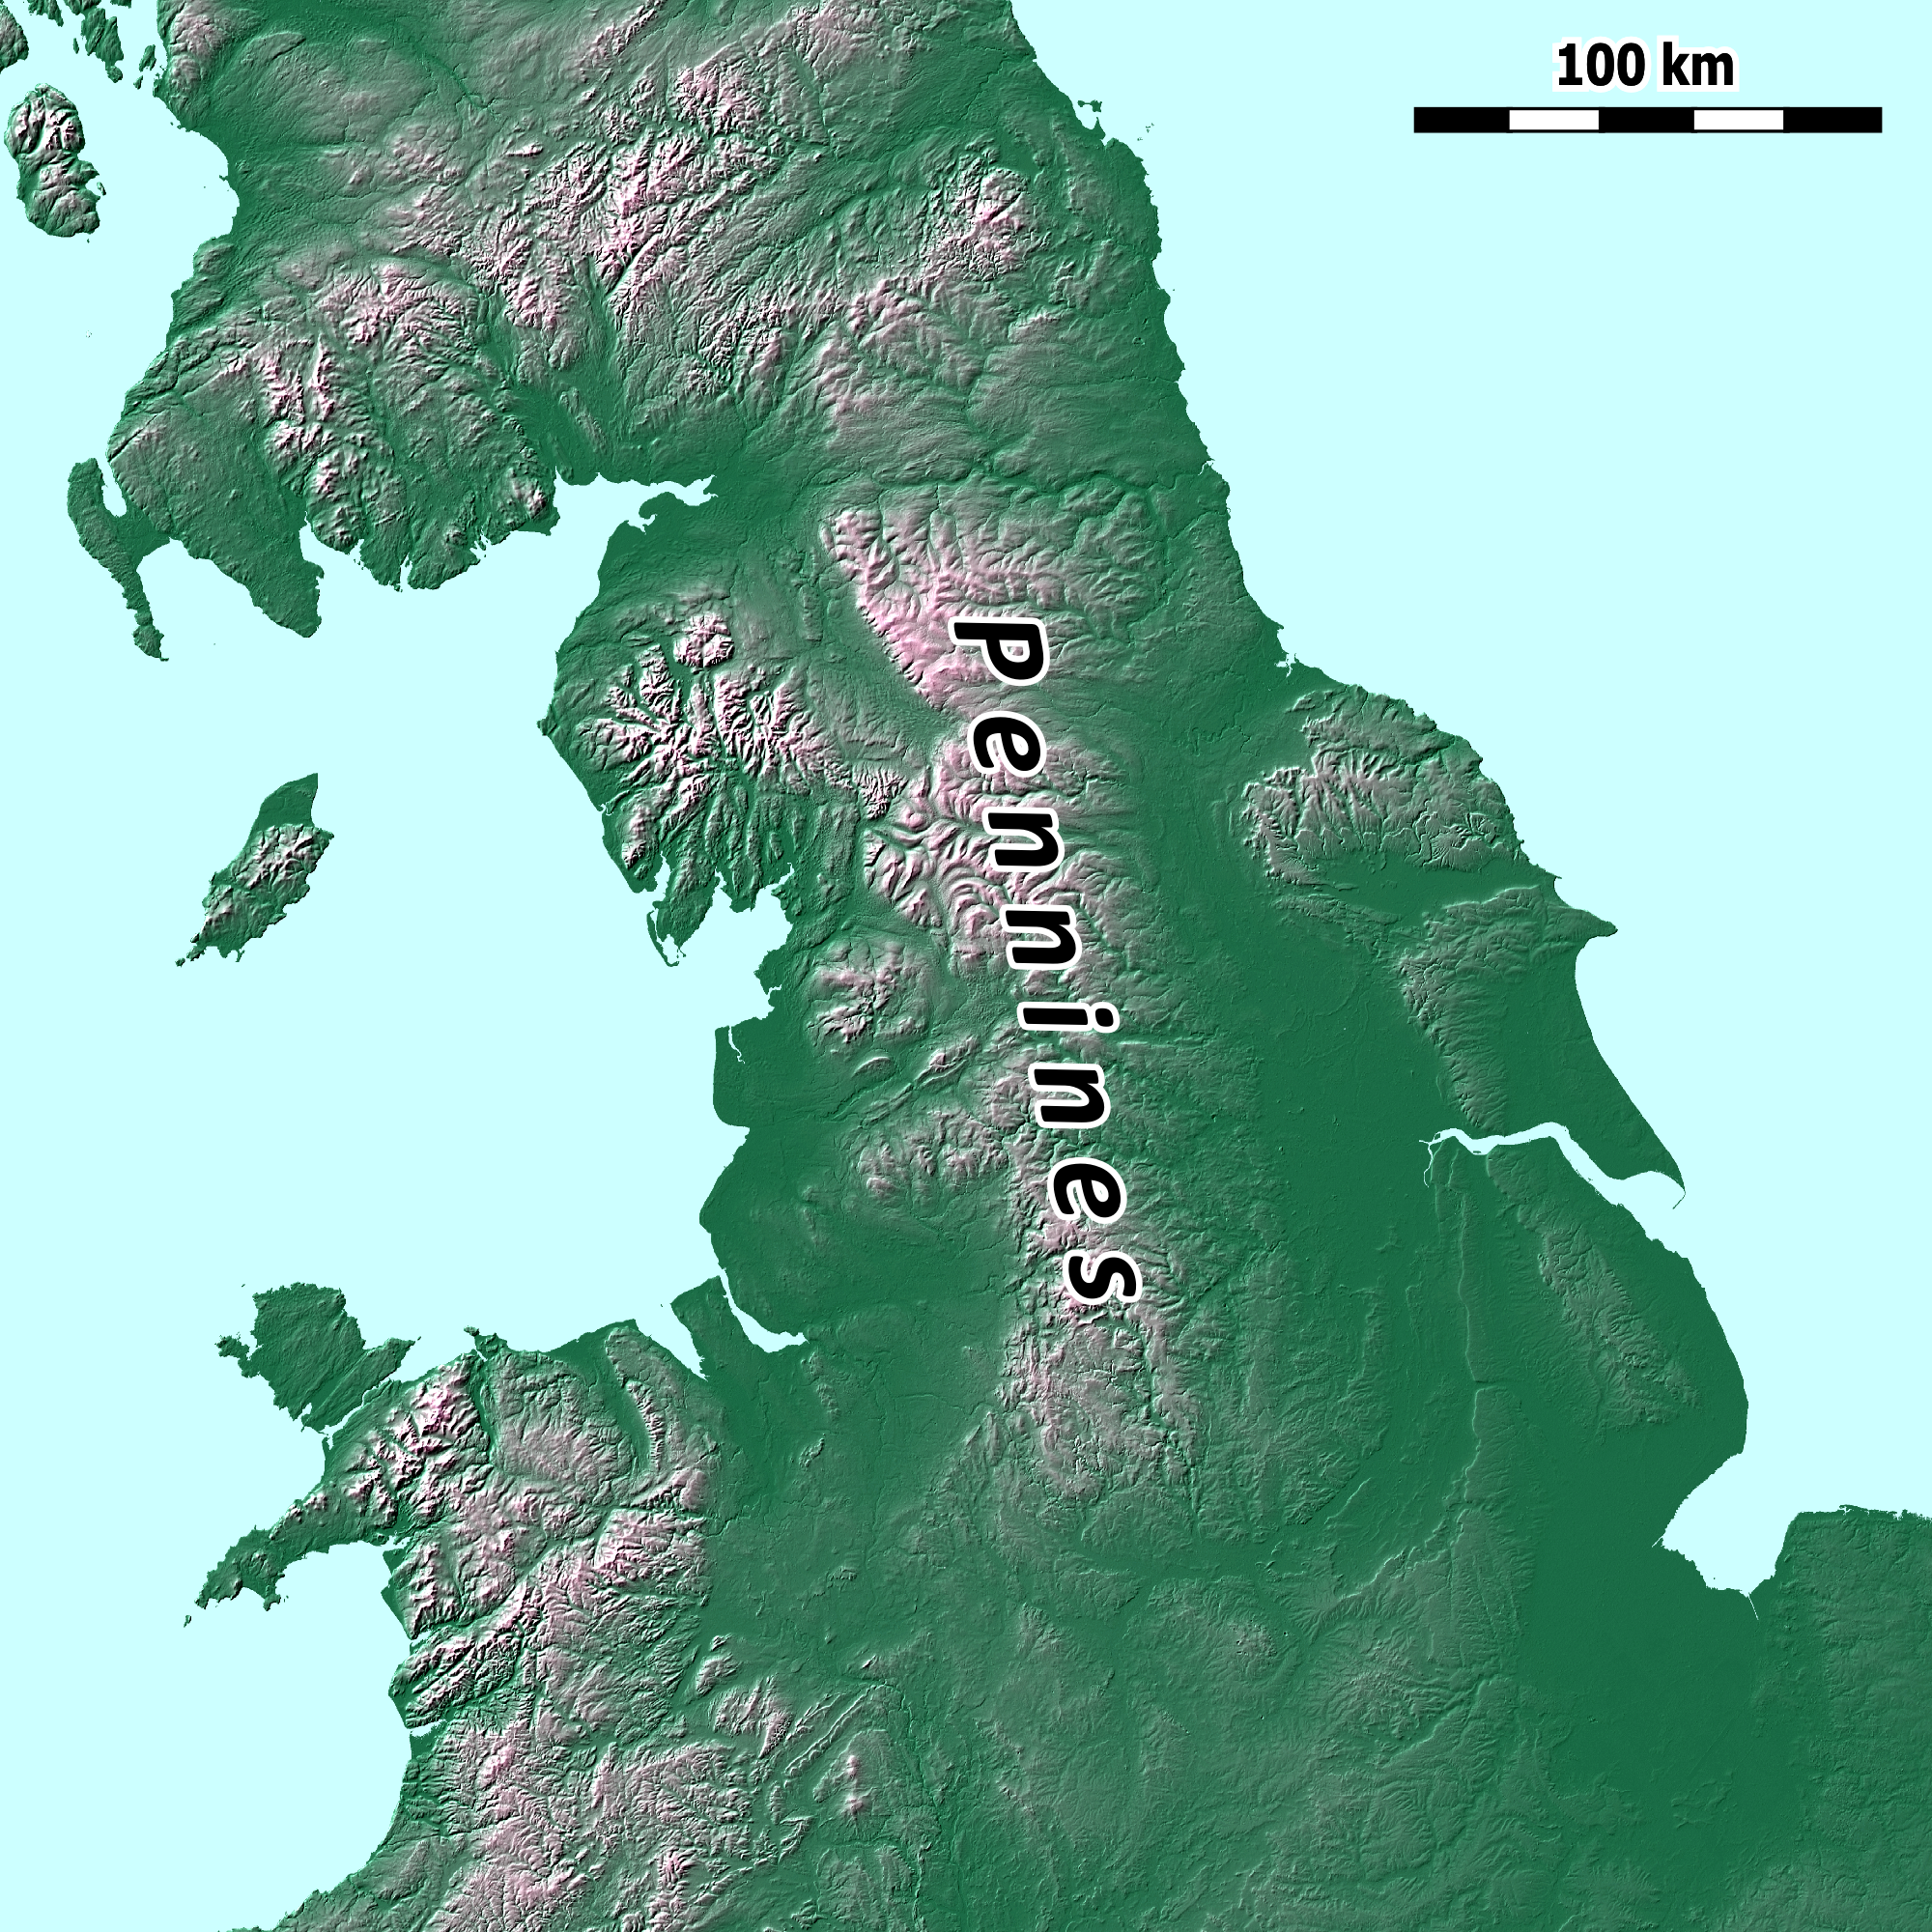 Pennines - Wikipedia